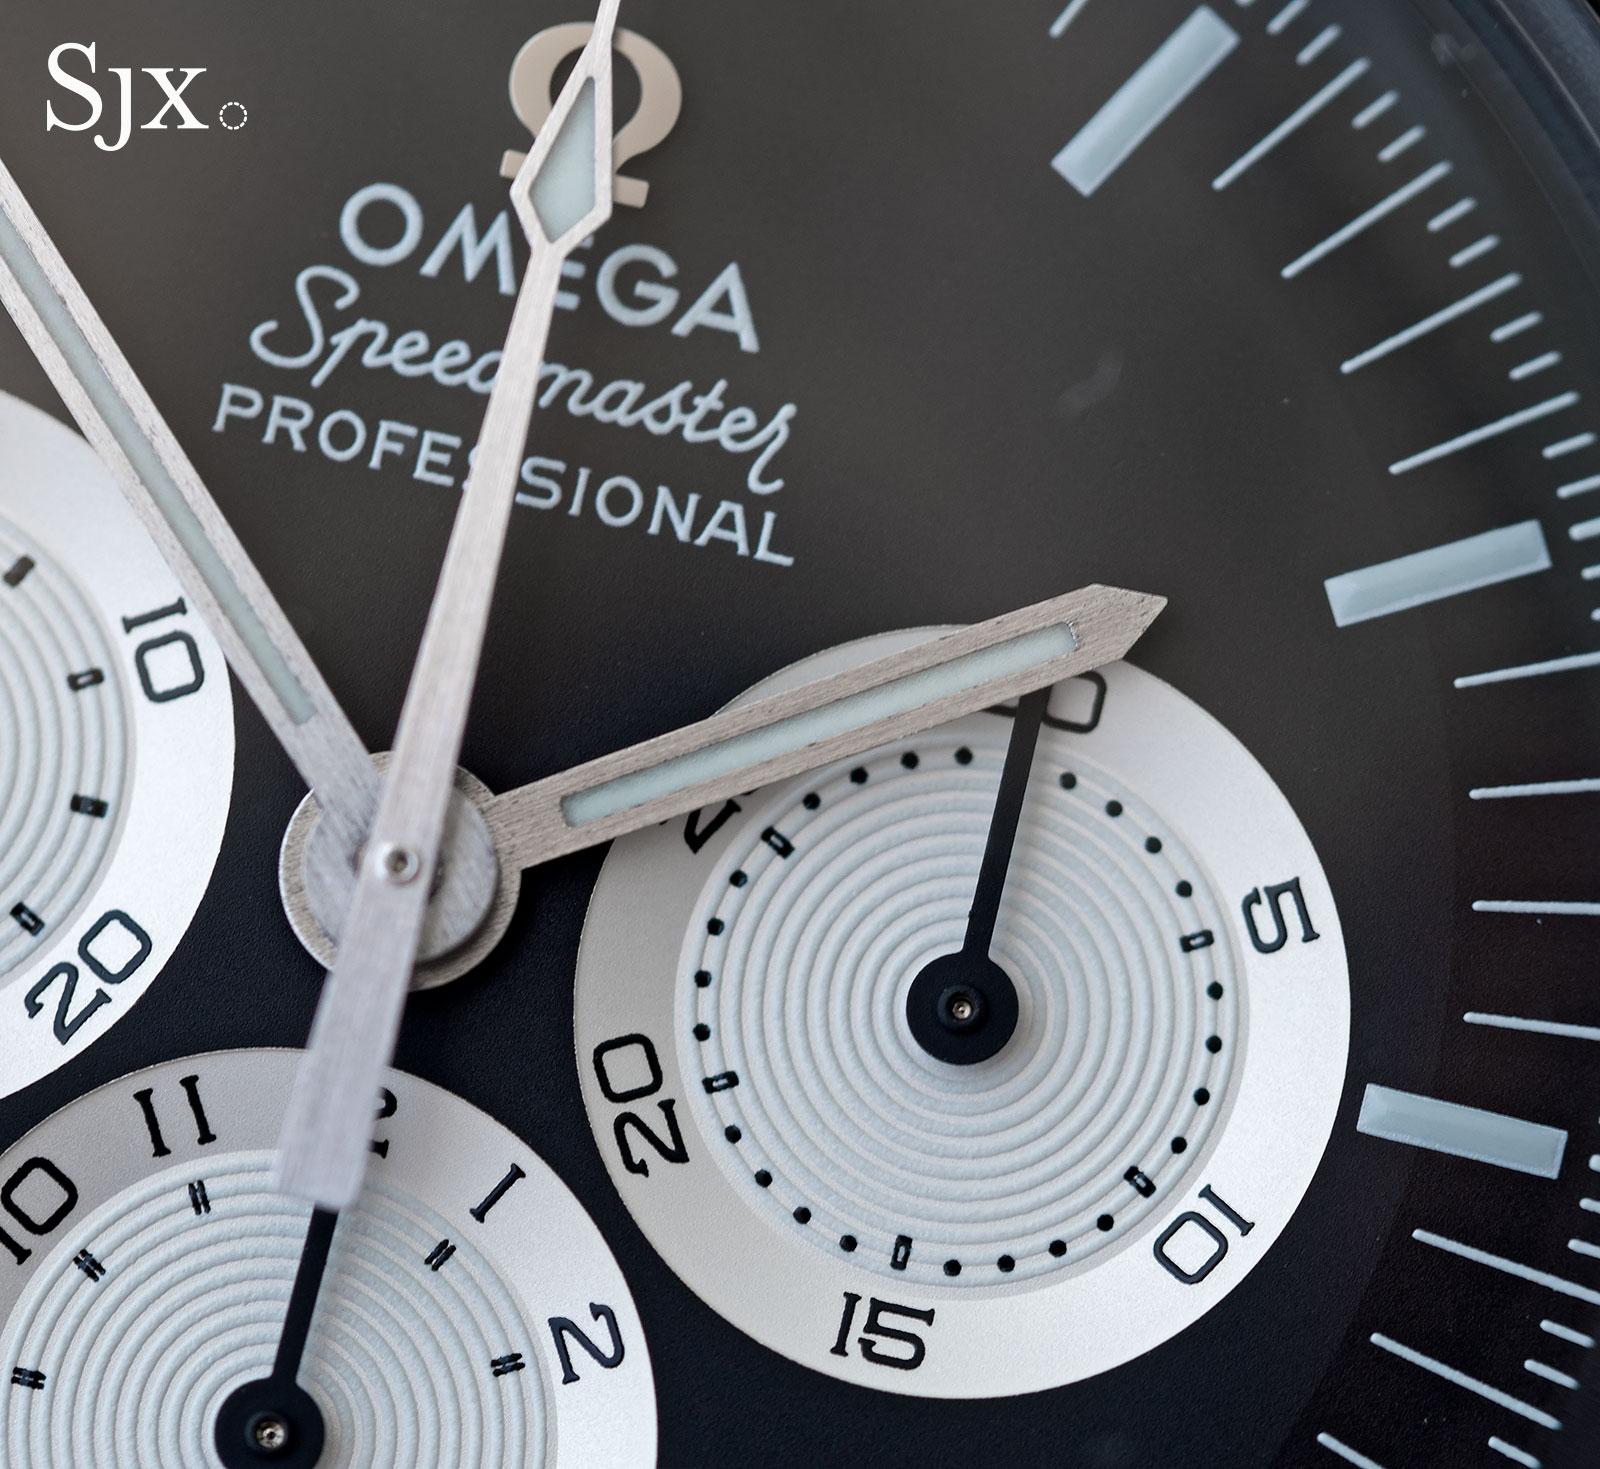 Omega Speedmaster Speedy Tuesday review 4